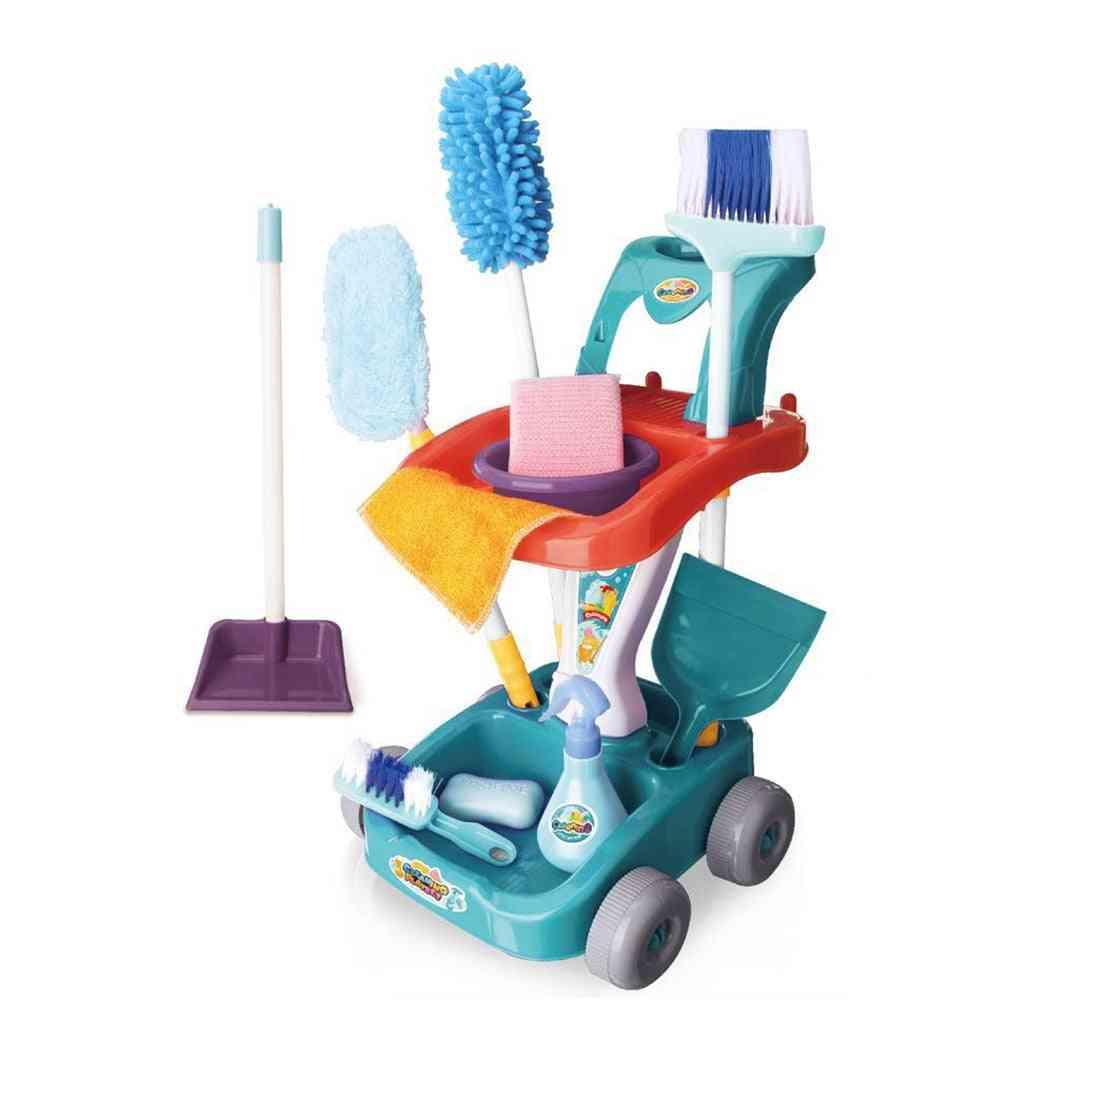 Children Pretend Play Simulation Cleaning Set